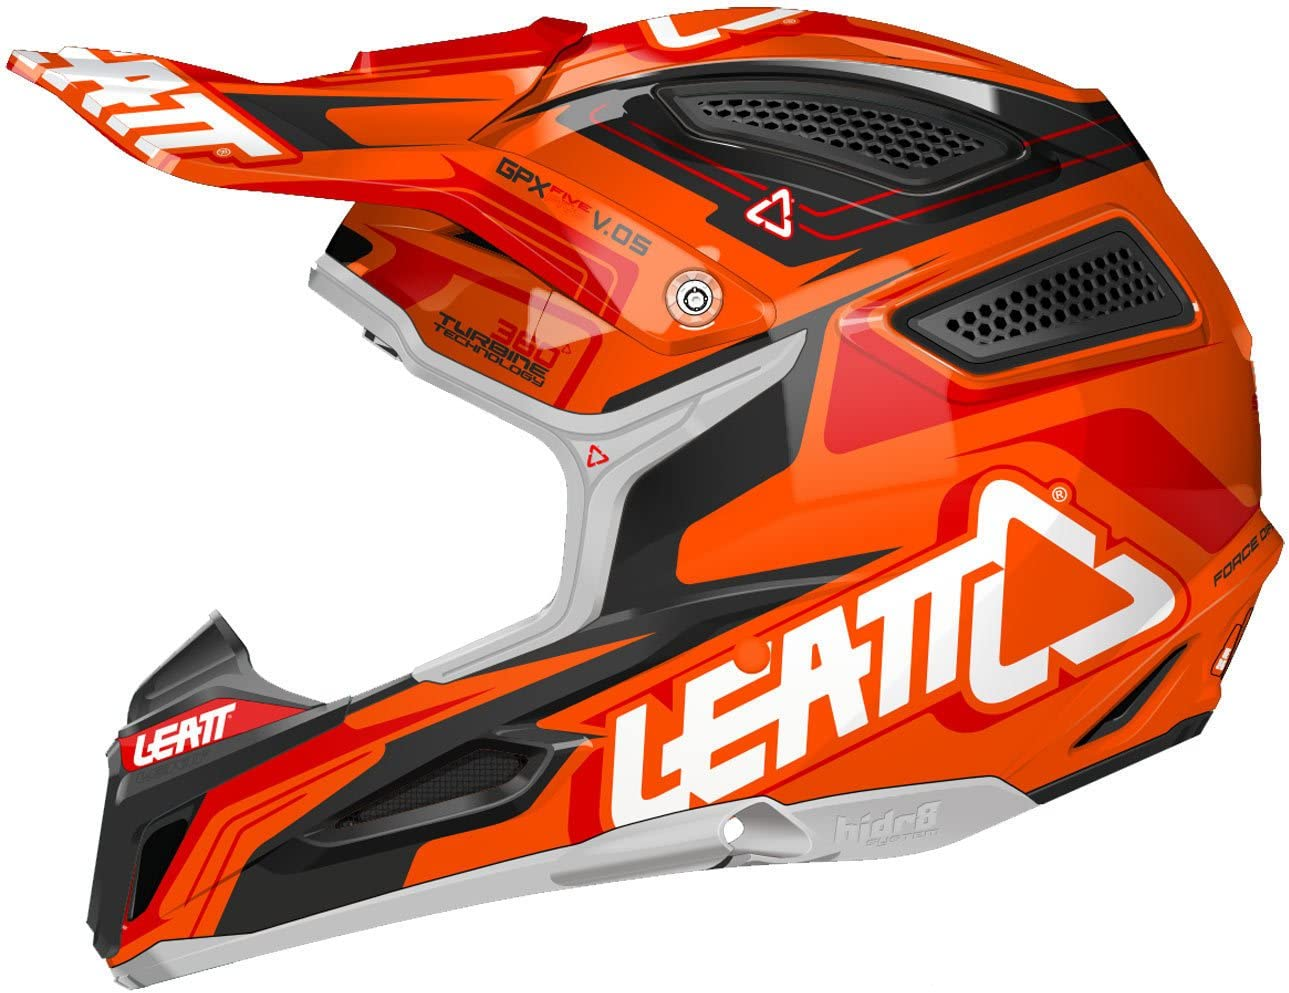 Leatt Gpx 5 5 Composite V05 Helmet Orange Black Red L Orange Auto